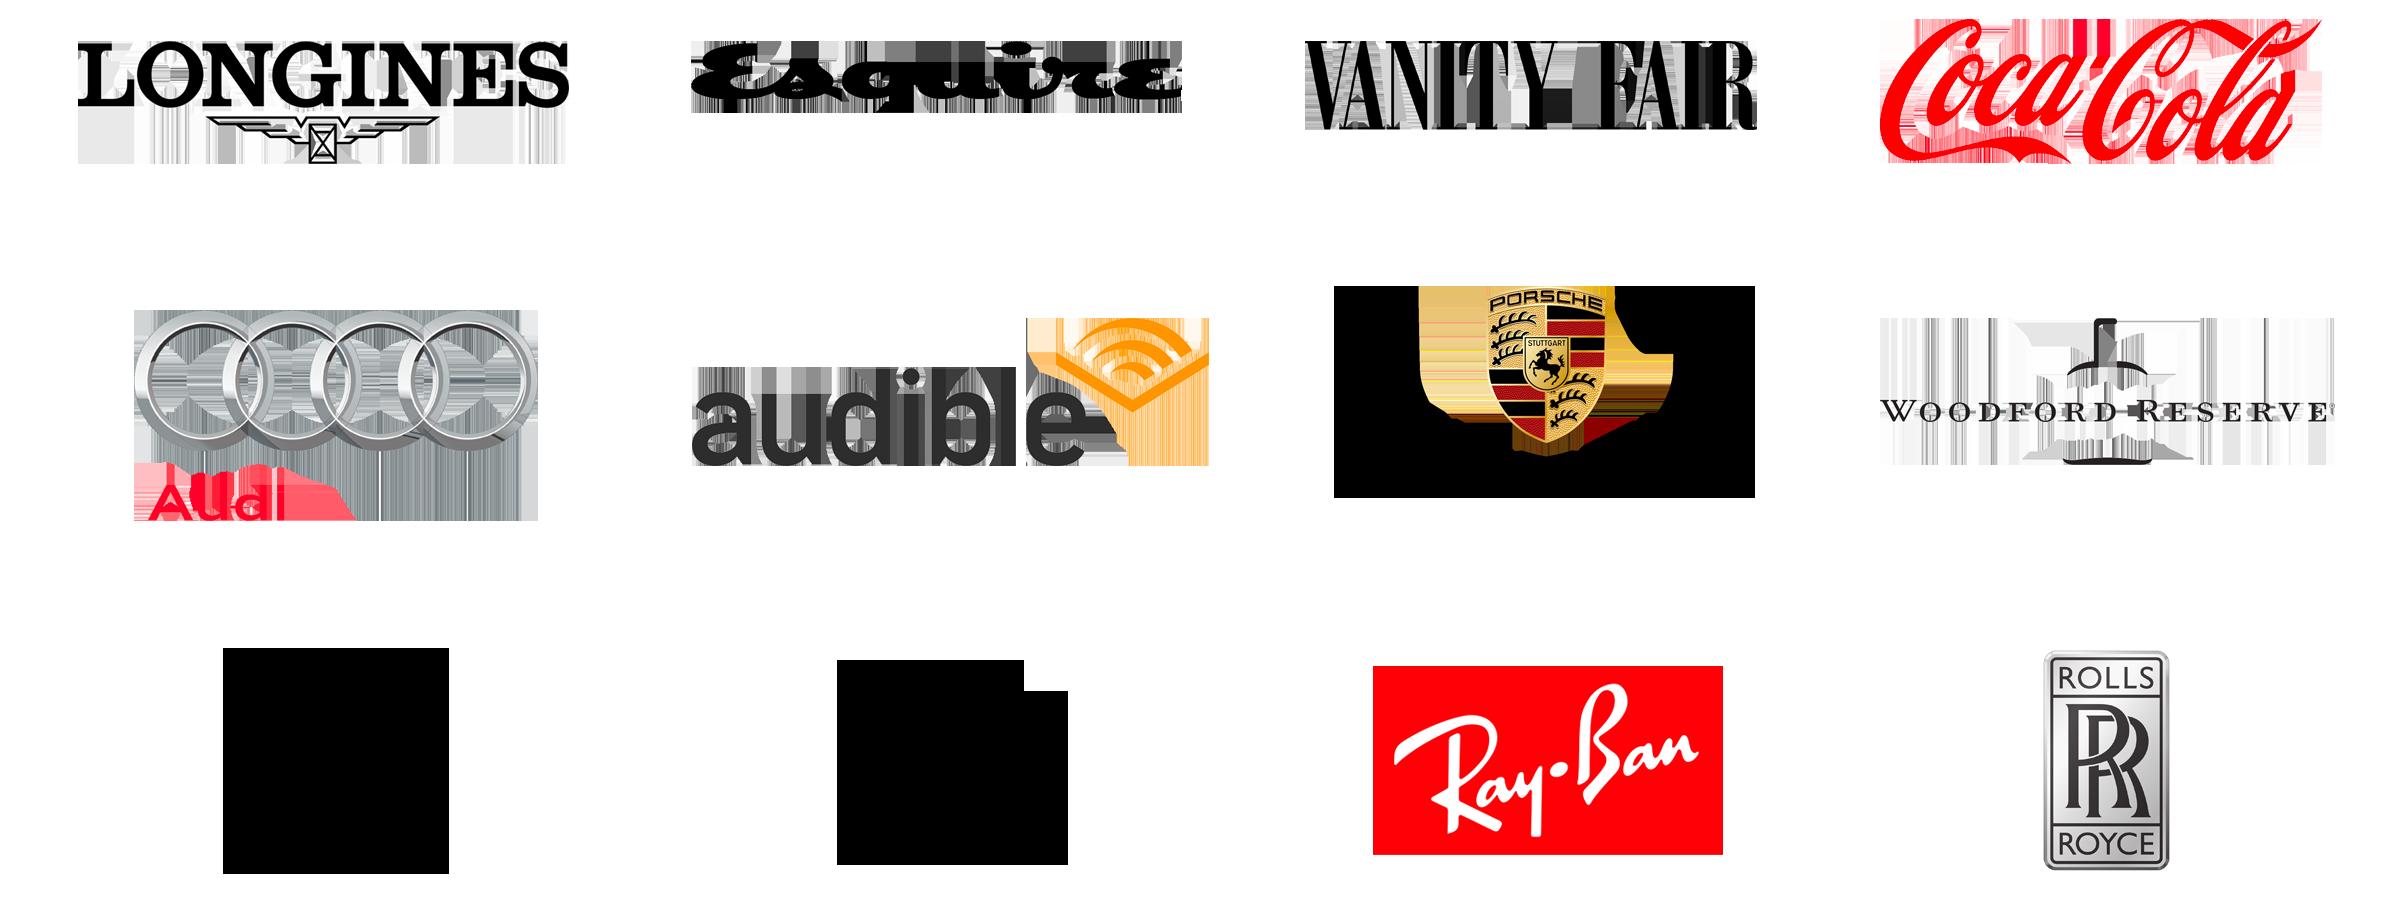 k16-brands-overlay2.png